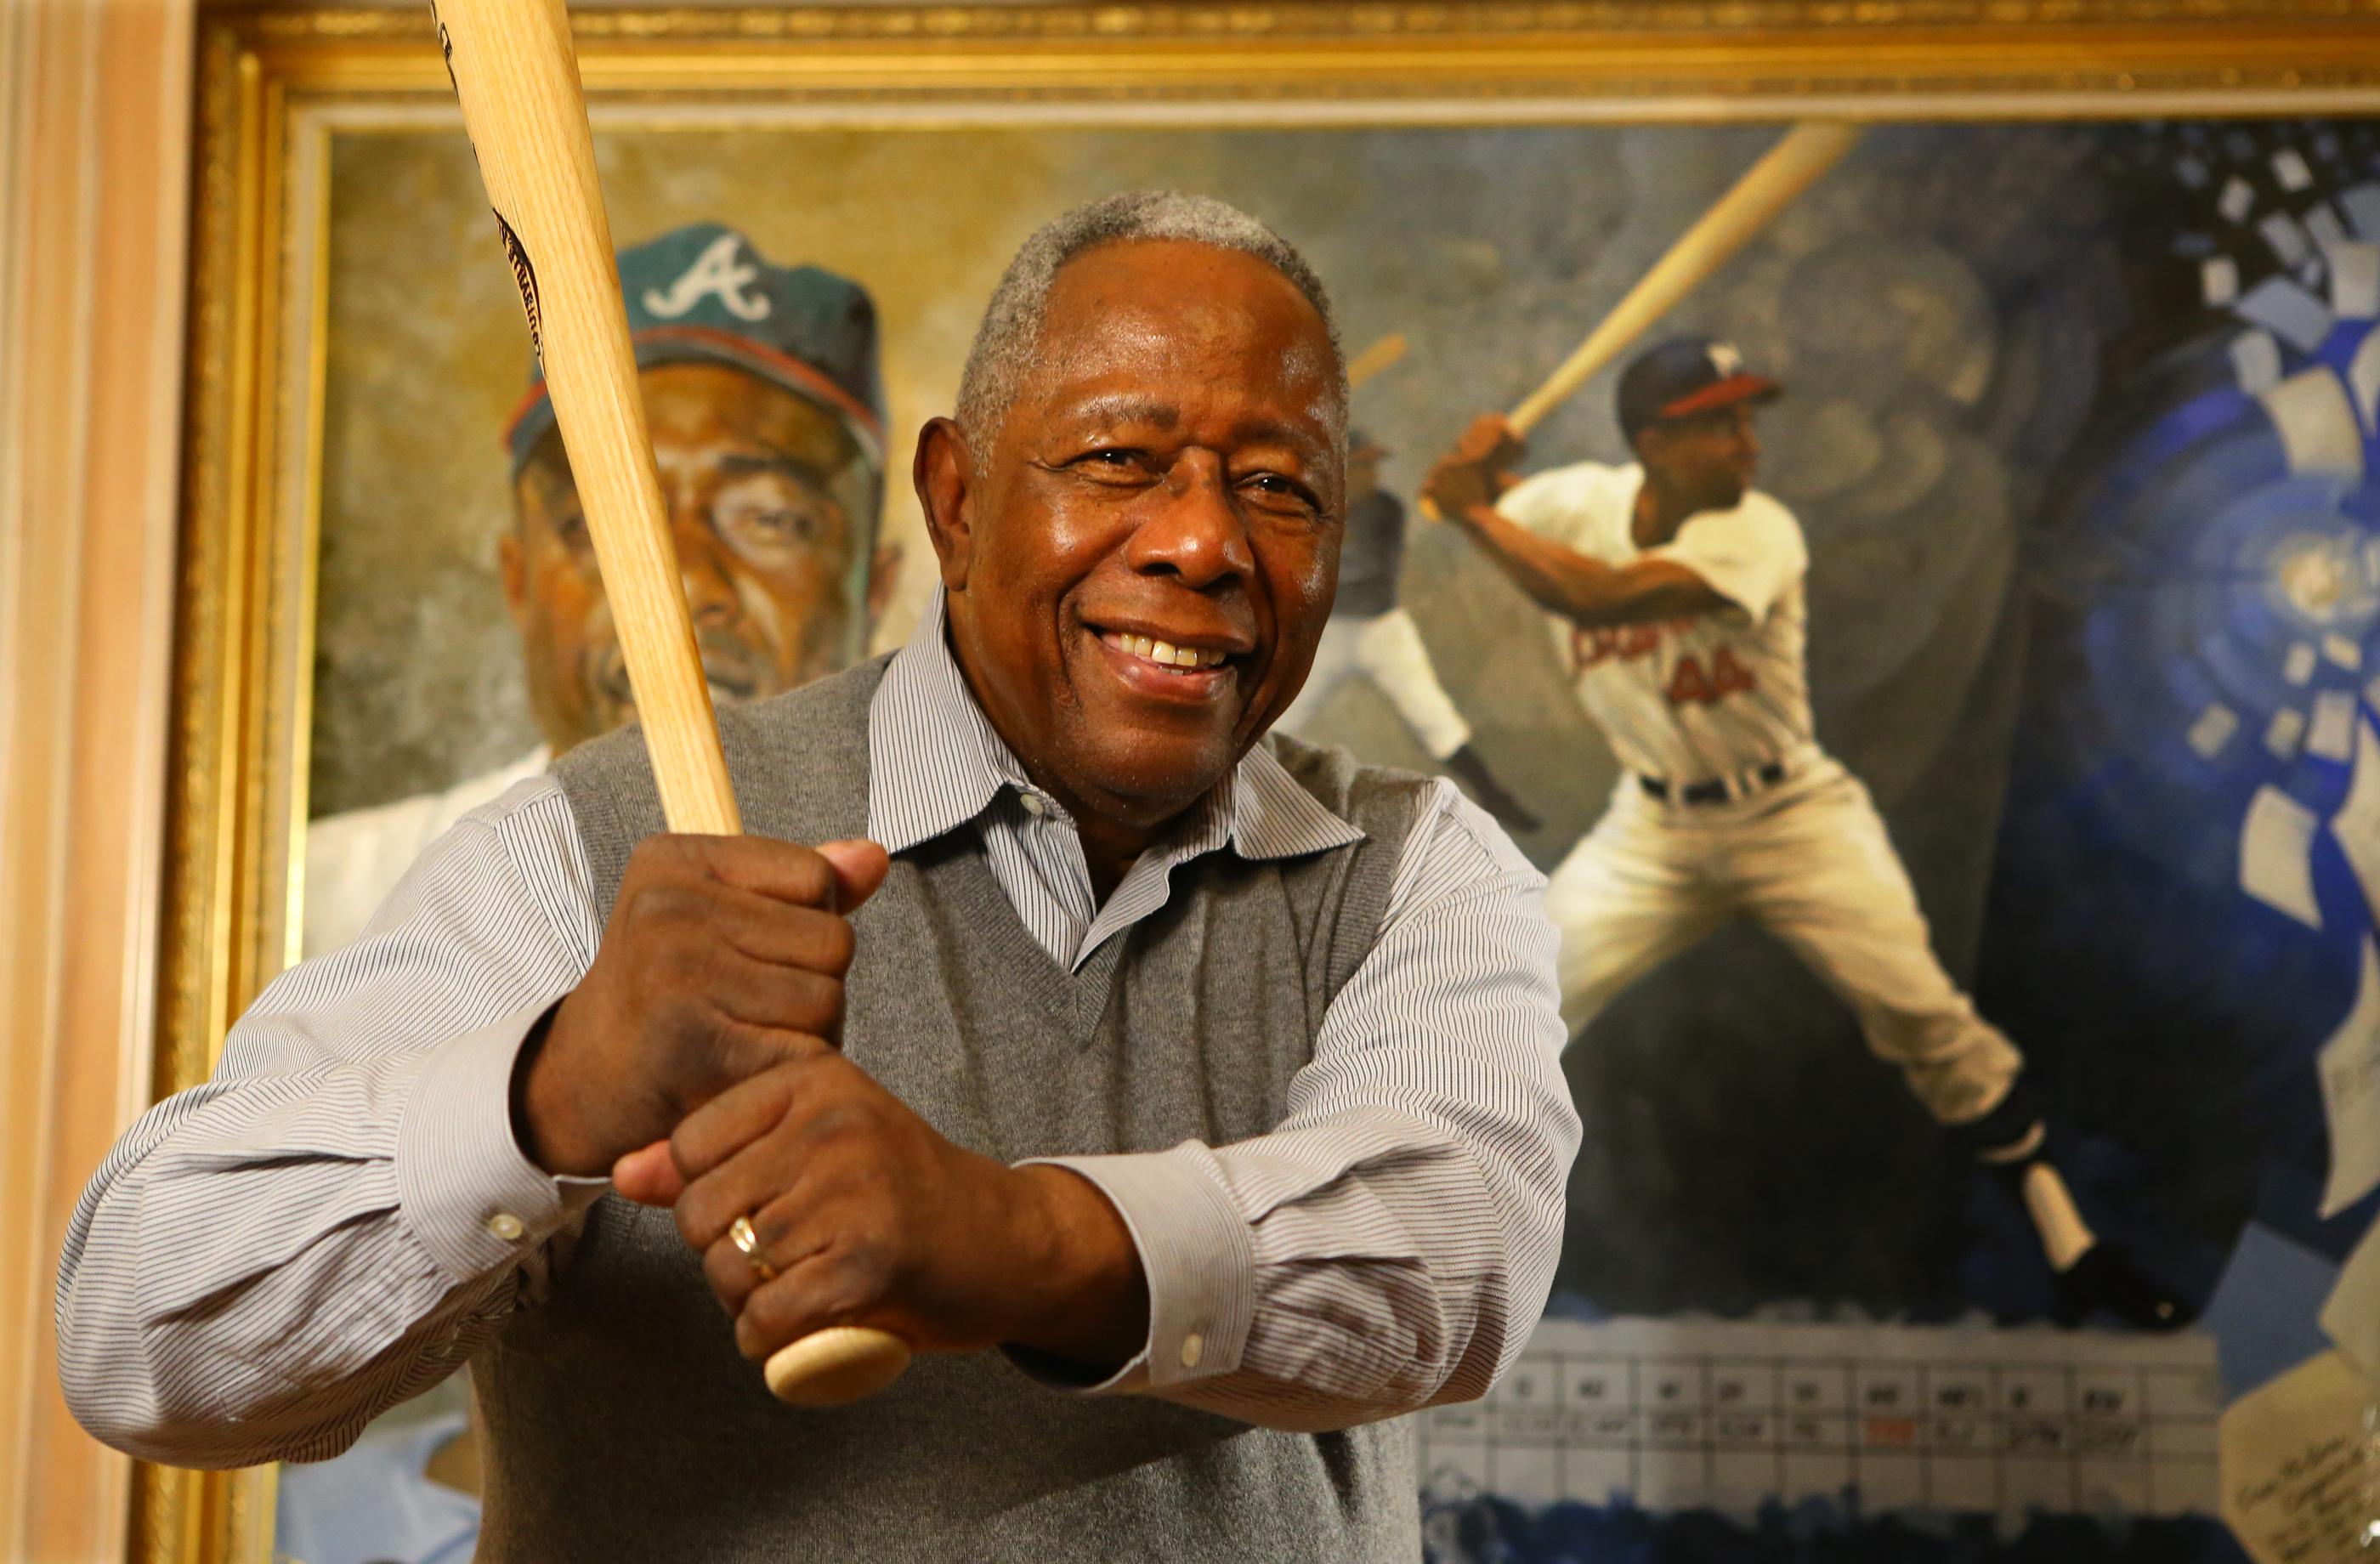 Baseball great Henry 'Hank' Aaron, 86, passes into history